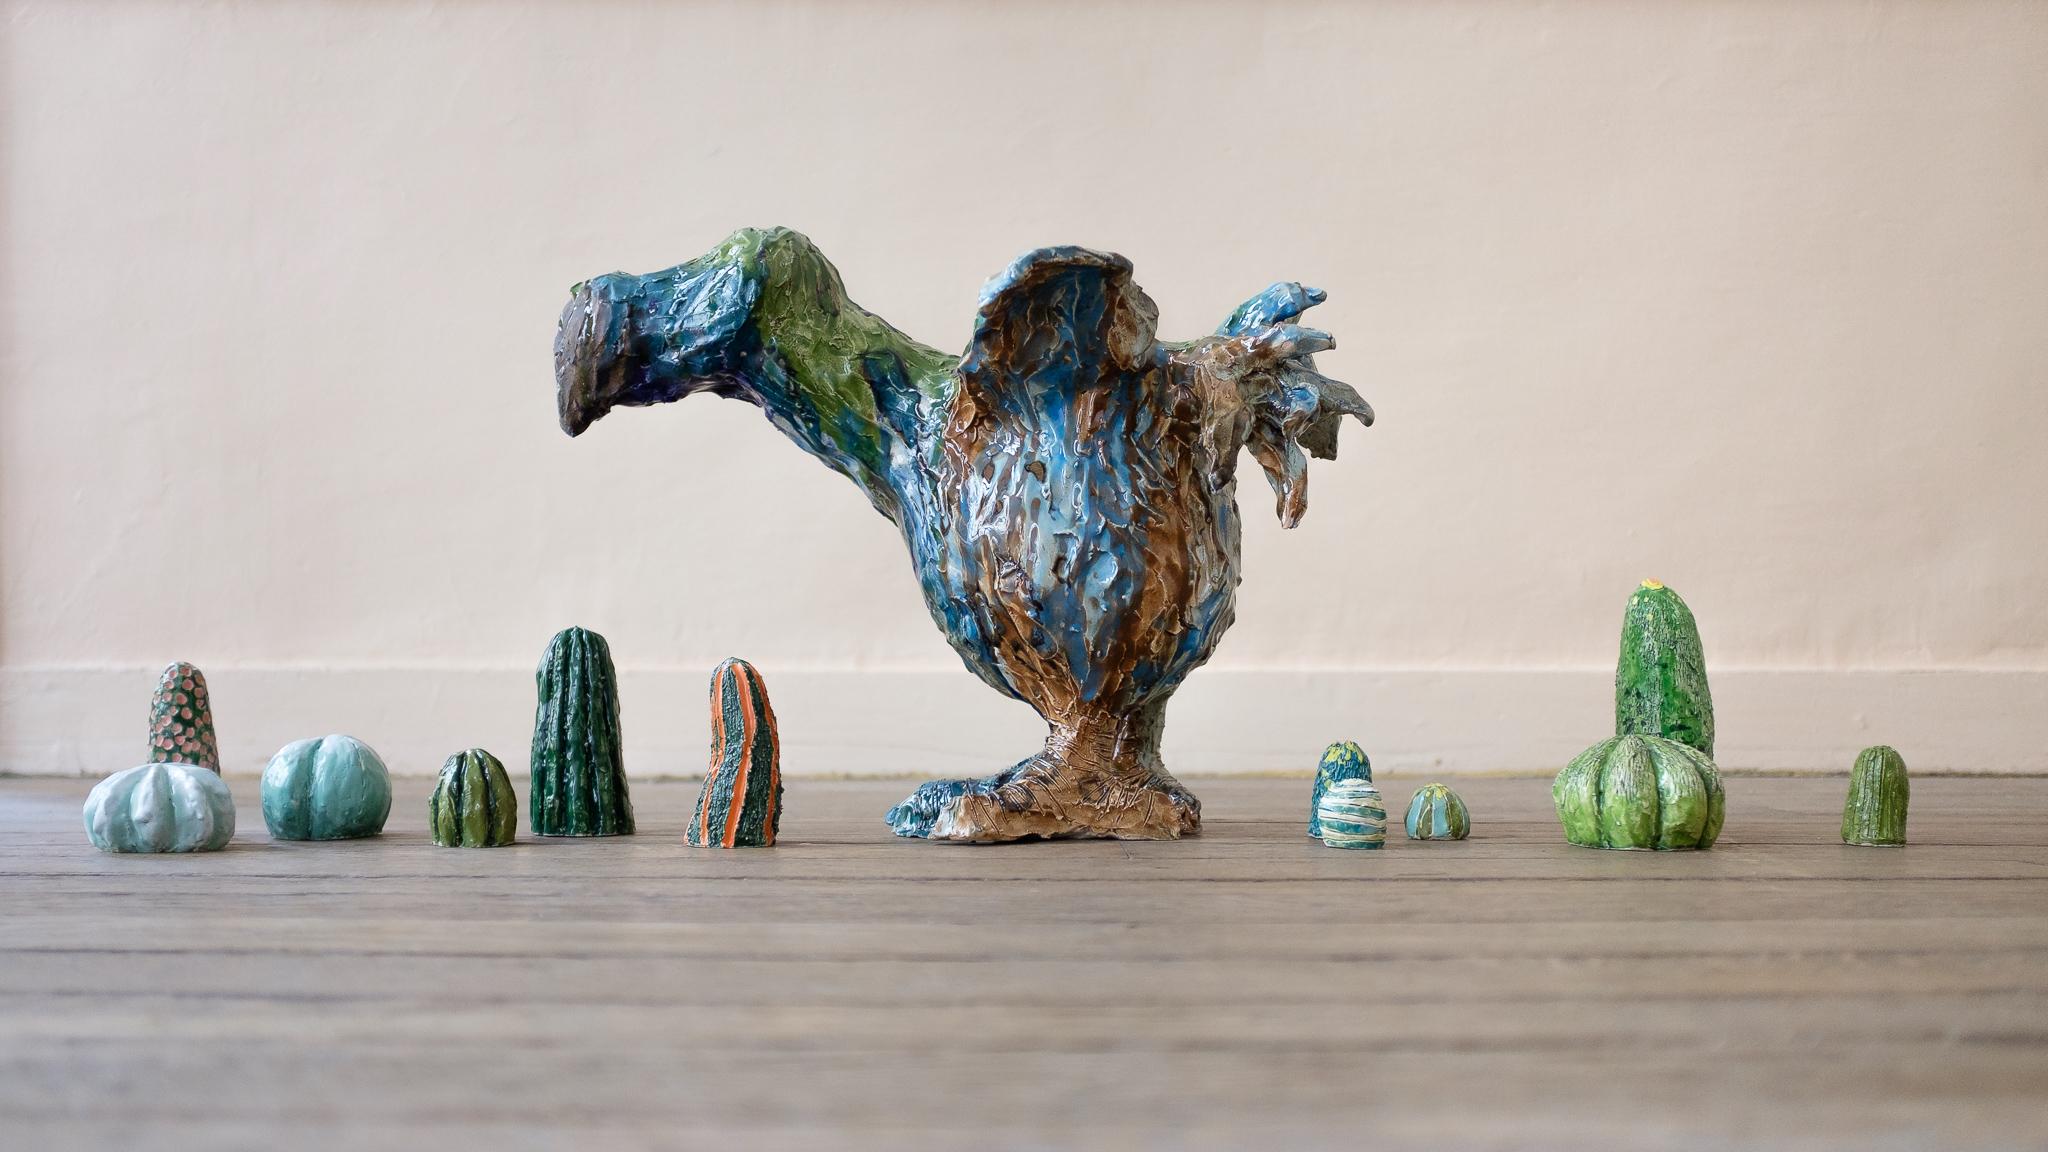 Dodo, Marina Le Gall 52 x 34 x 24cm &Cactus, Agathe Brahami Ferron,céramique émaillée.